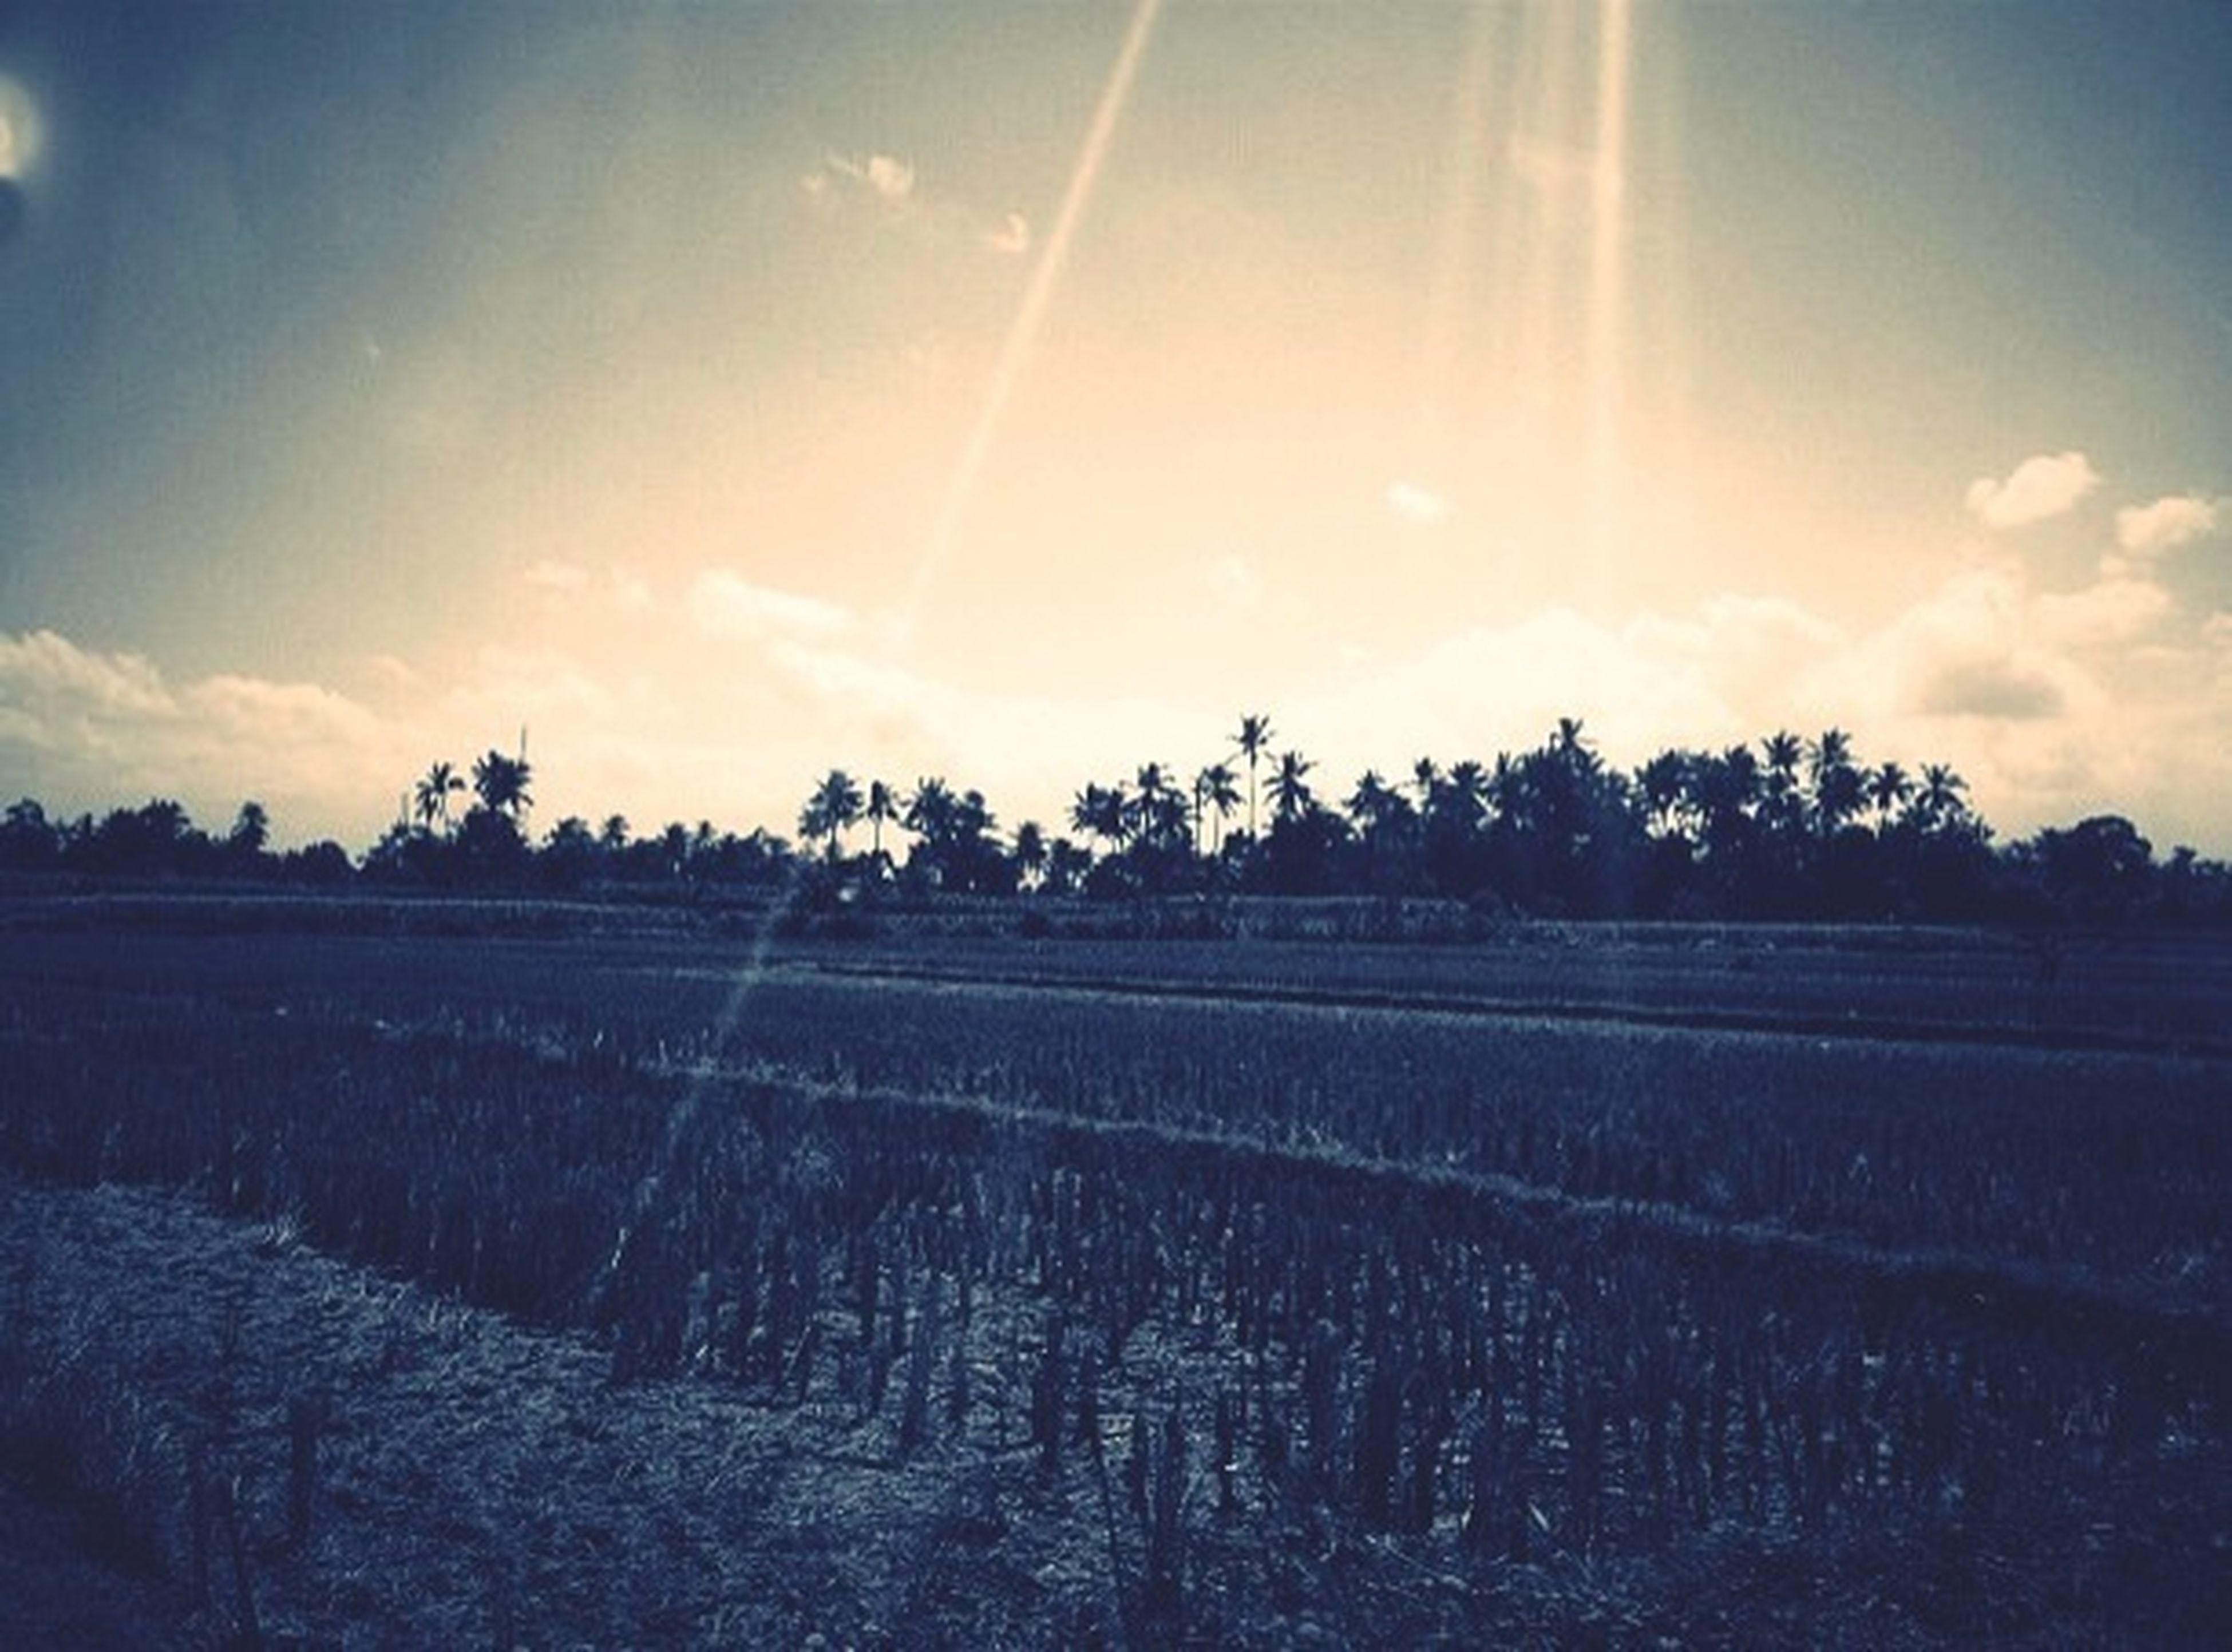 sky, field, landscape, tranquility, sunlight, sun, tranquil scene, sunbeam, cloud - sky, tree, nature, rural scene, road, grass, beauty in nature, scenics, lens flare, cloud, growth, no people